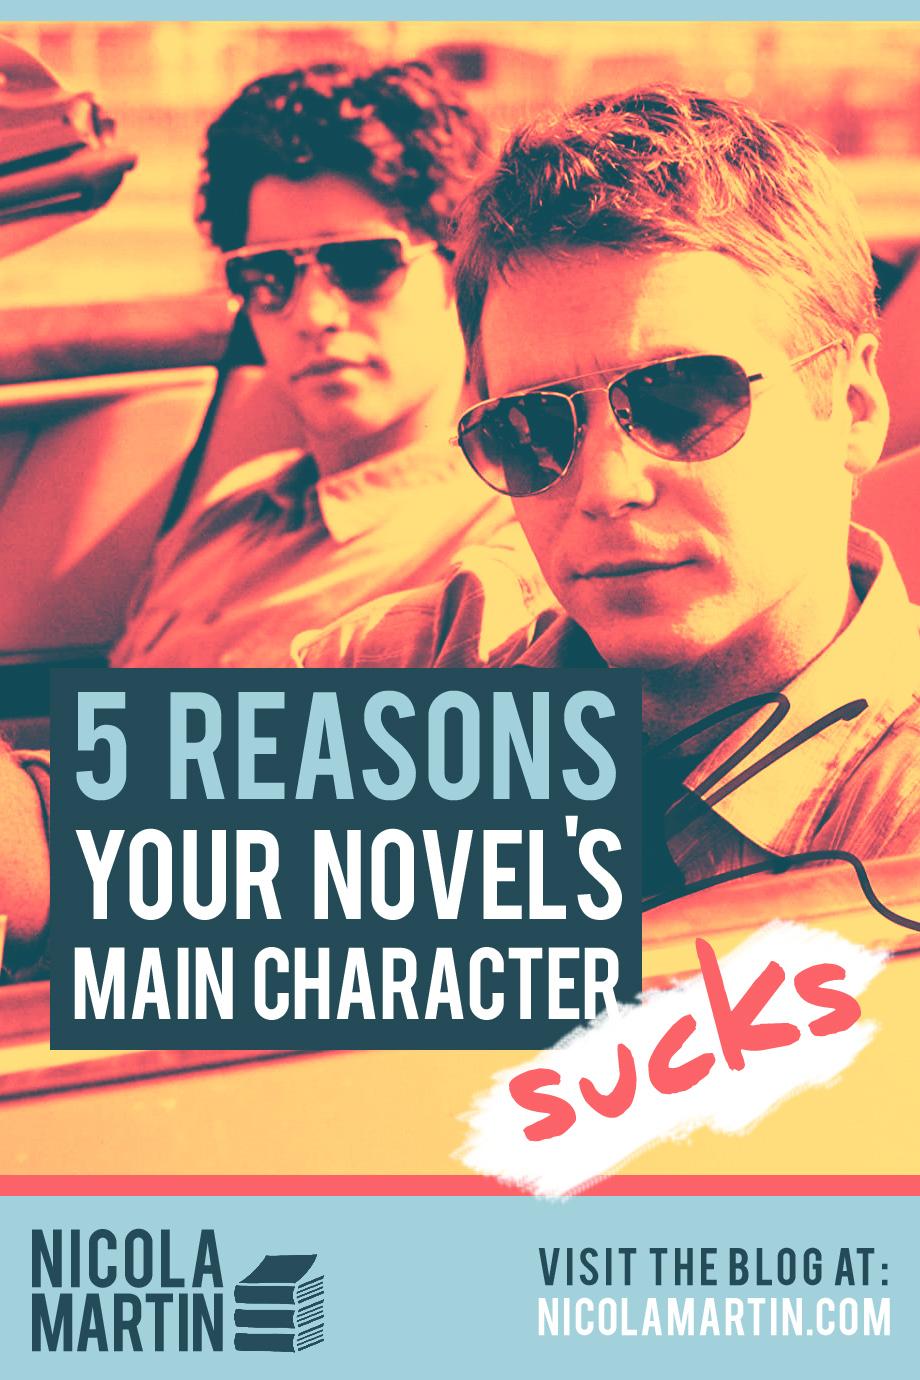 5 reasons your novel's main character sucks